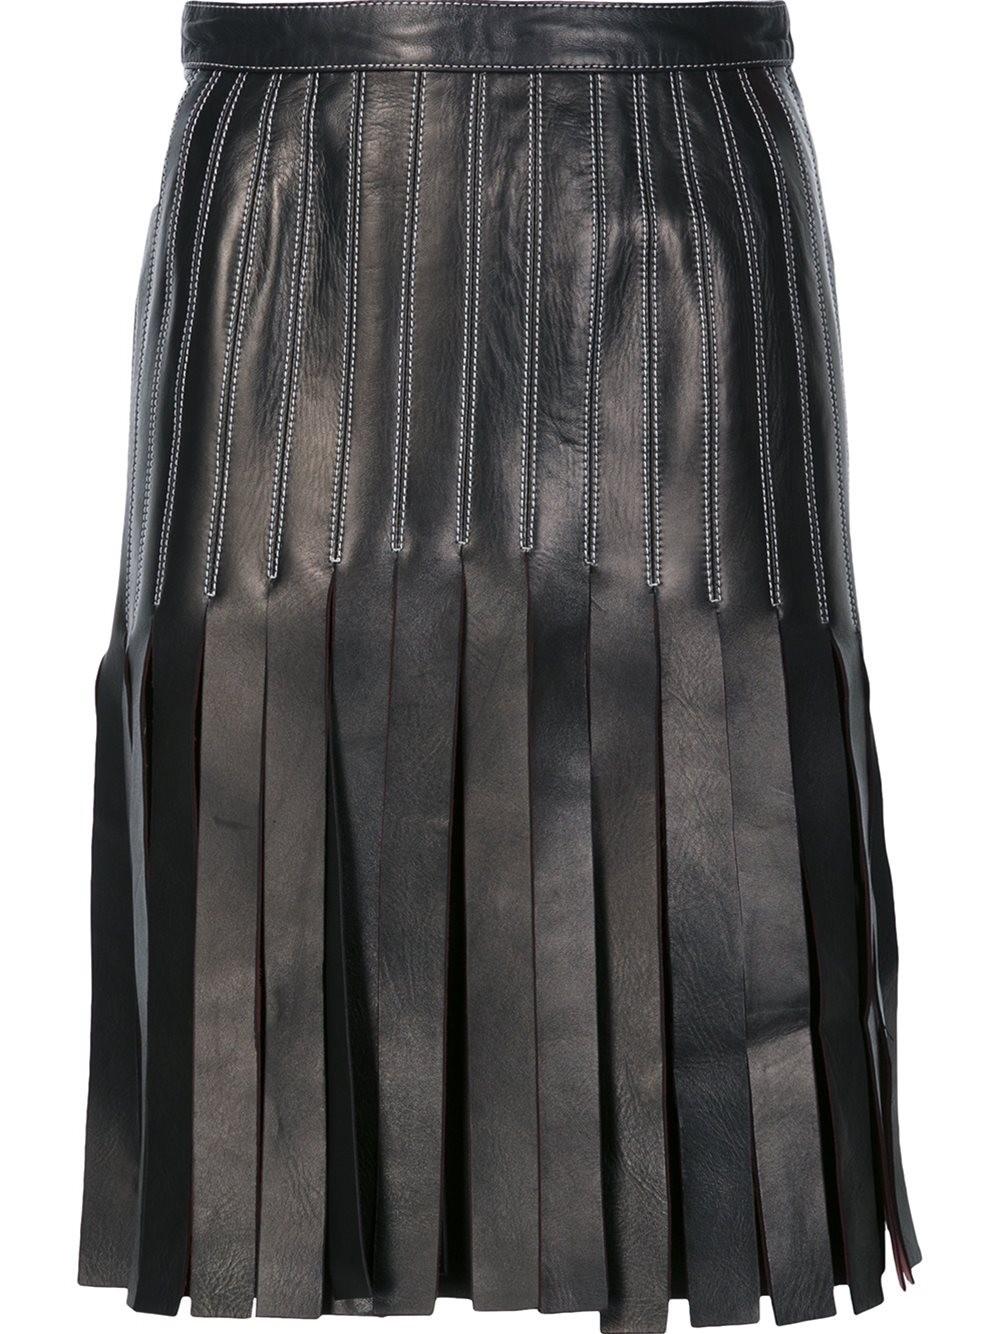 MUGLER BLACK STRAPPY A-LINE SKIRT